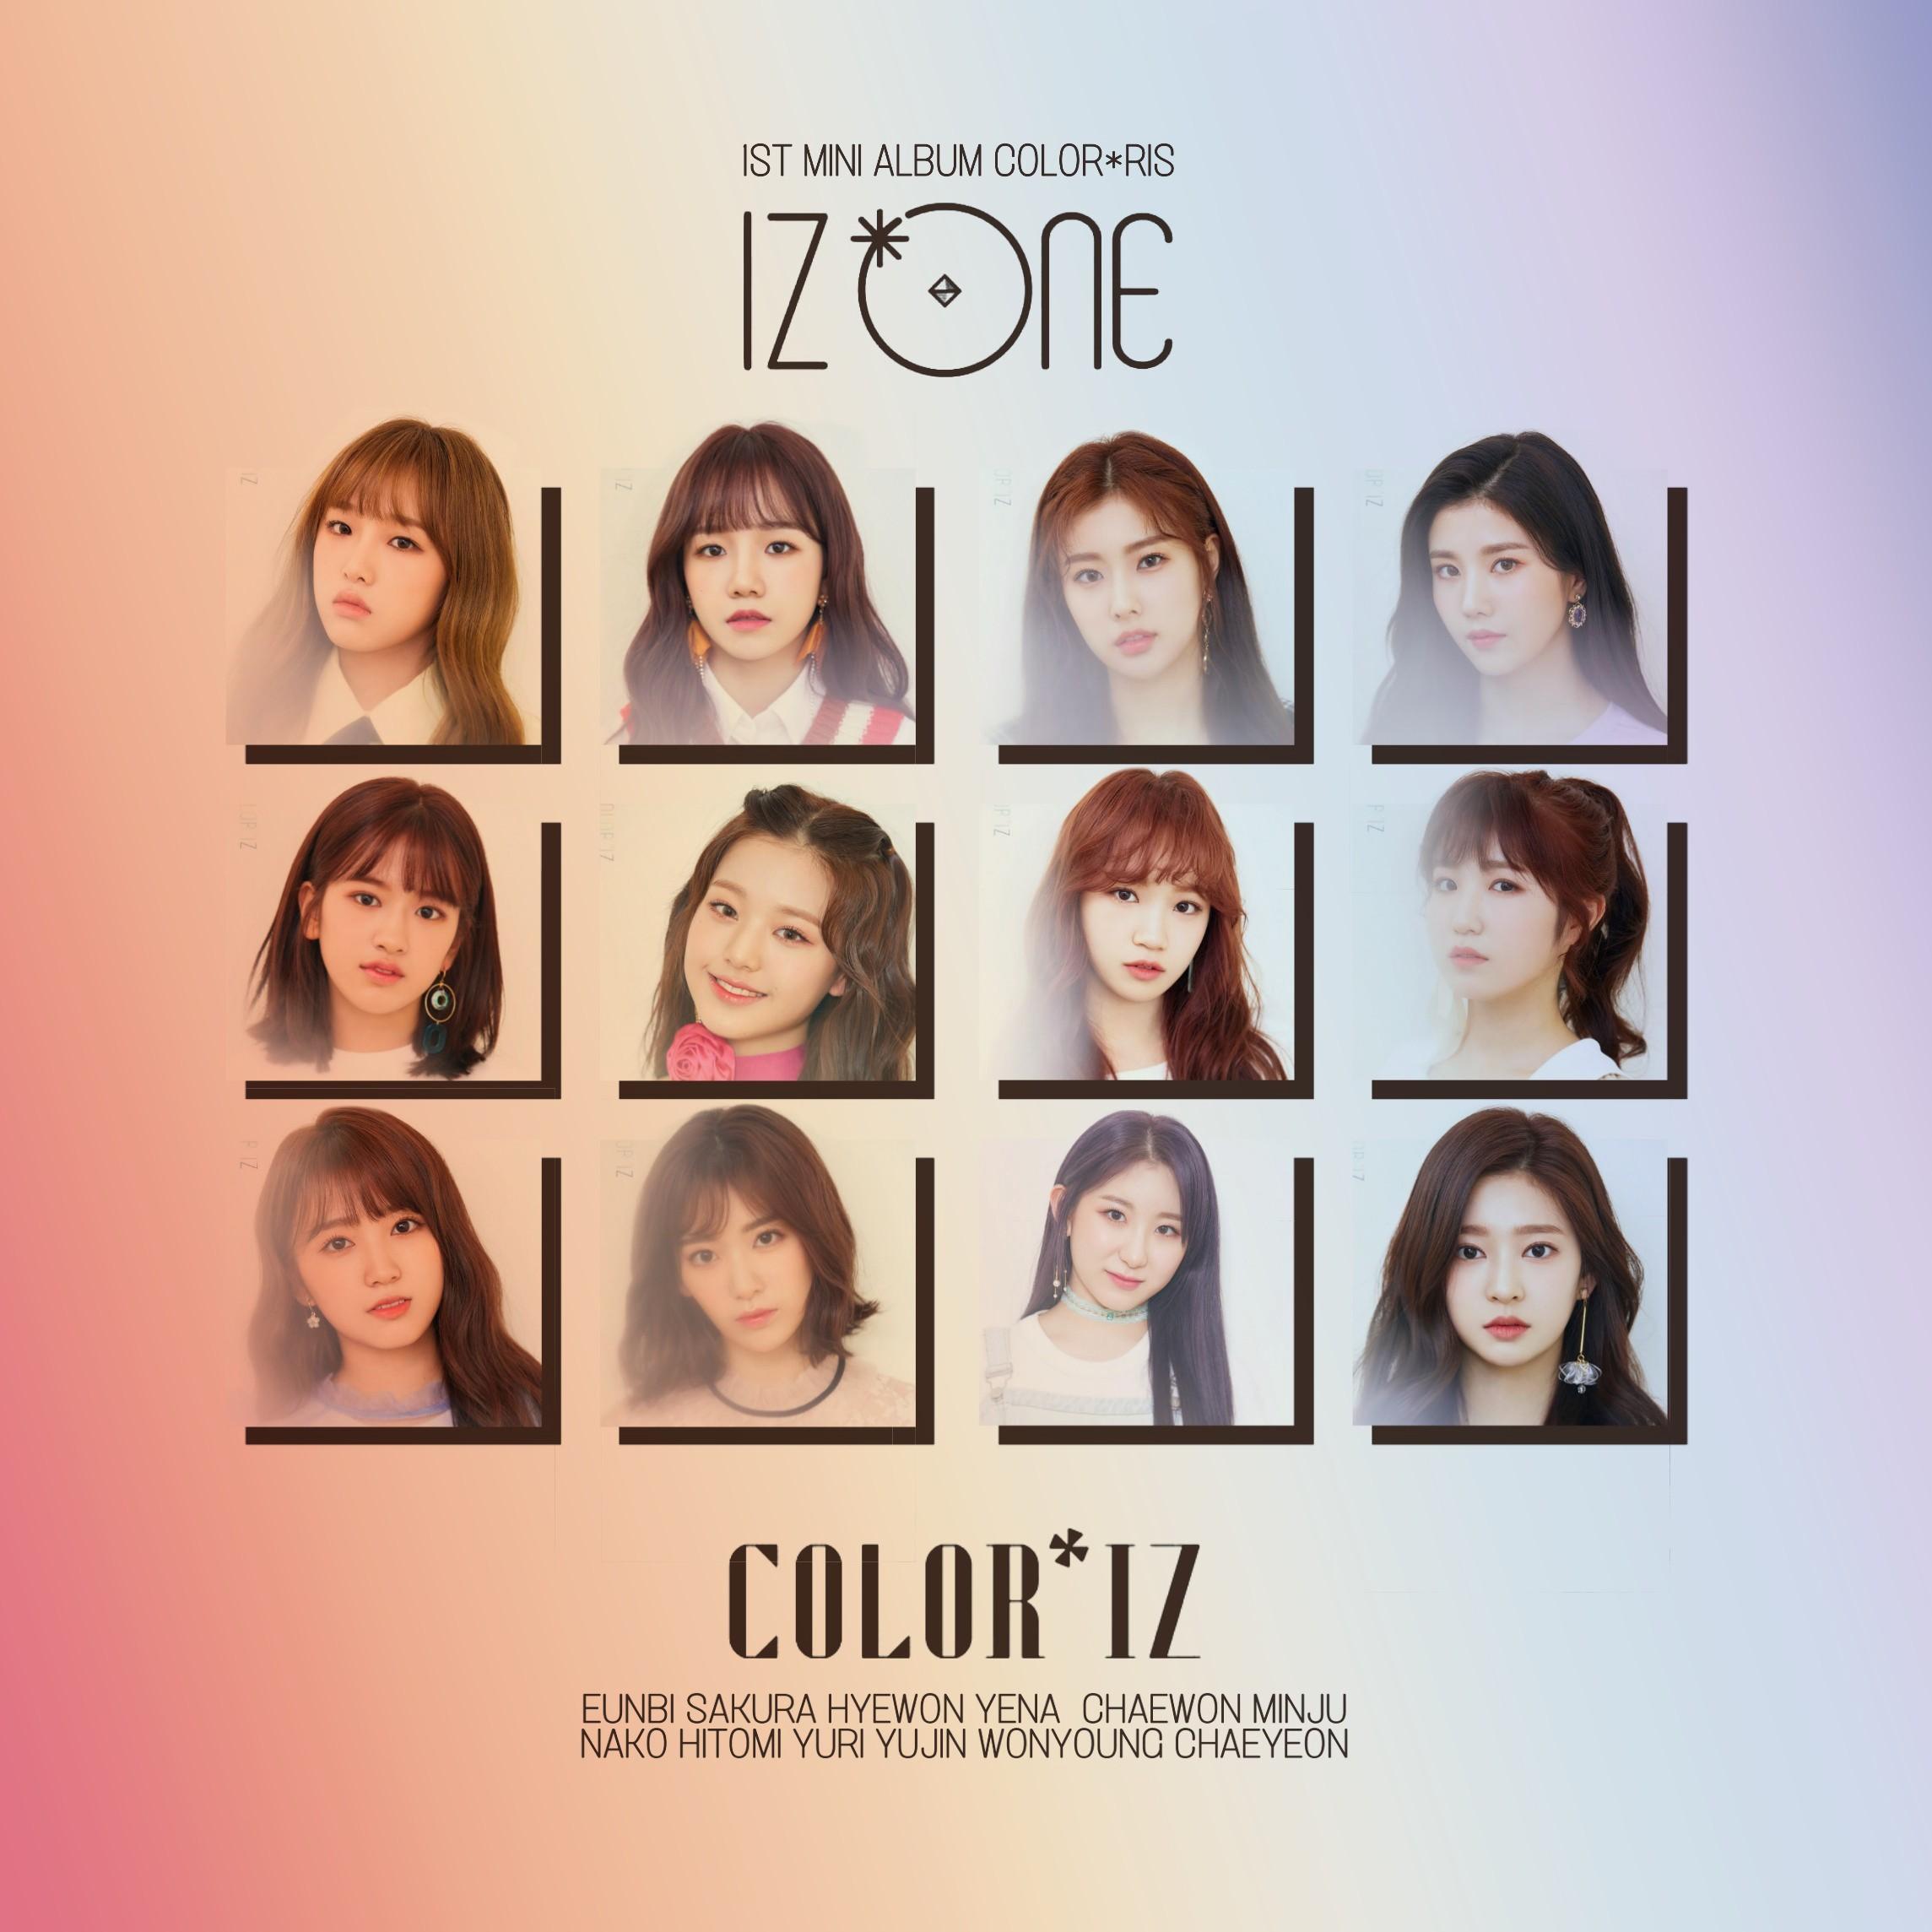 IZ*ONE LA VIE EN ROSE / COLOR*IZ album cover by LEAlbum on